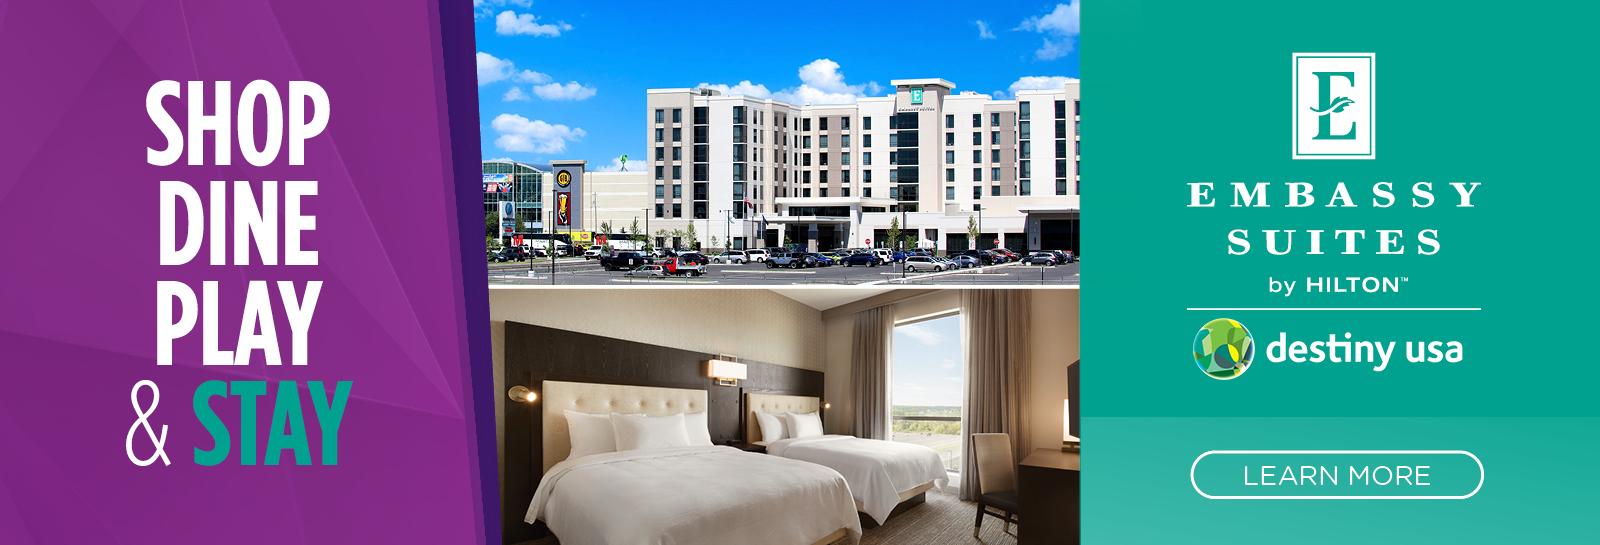 2019 Hotel HomepageSlider 1600x545 1